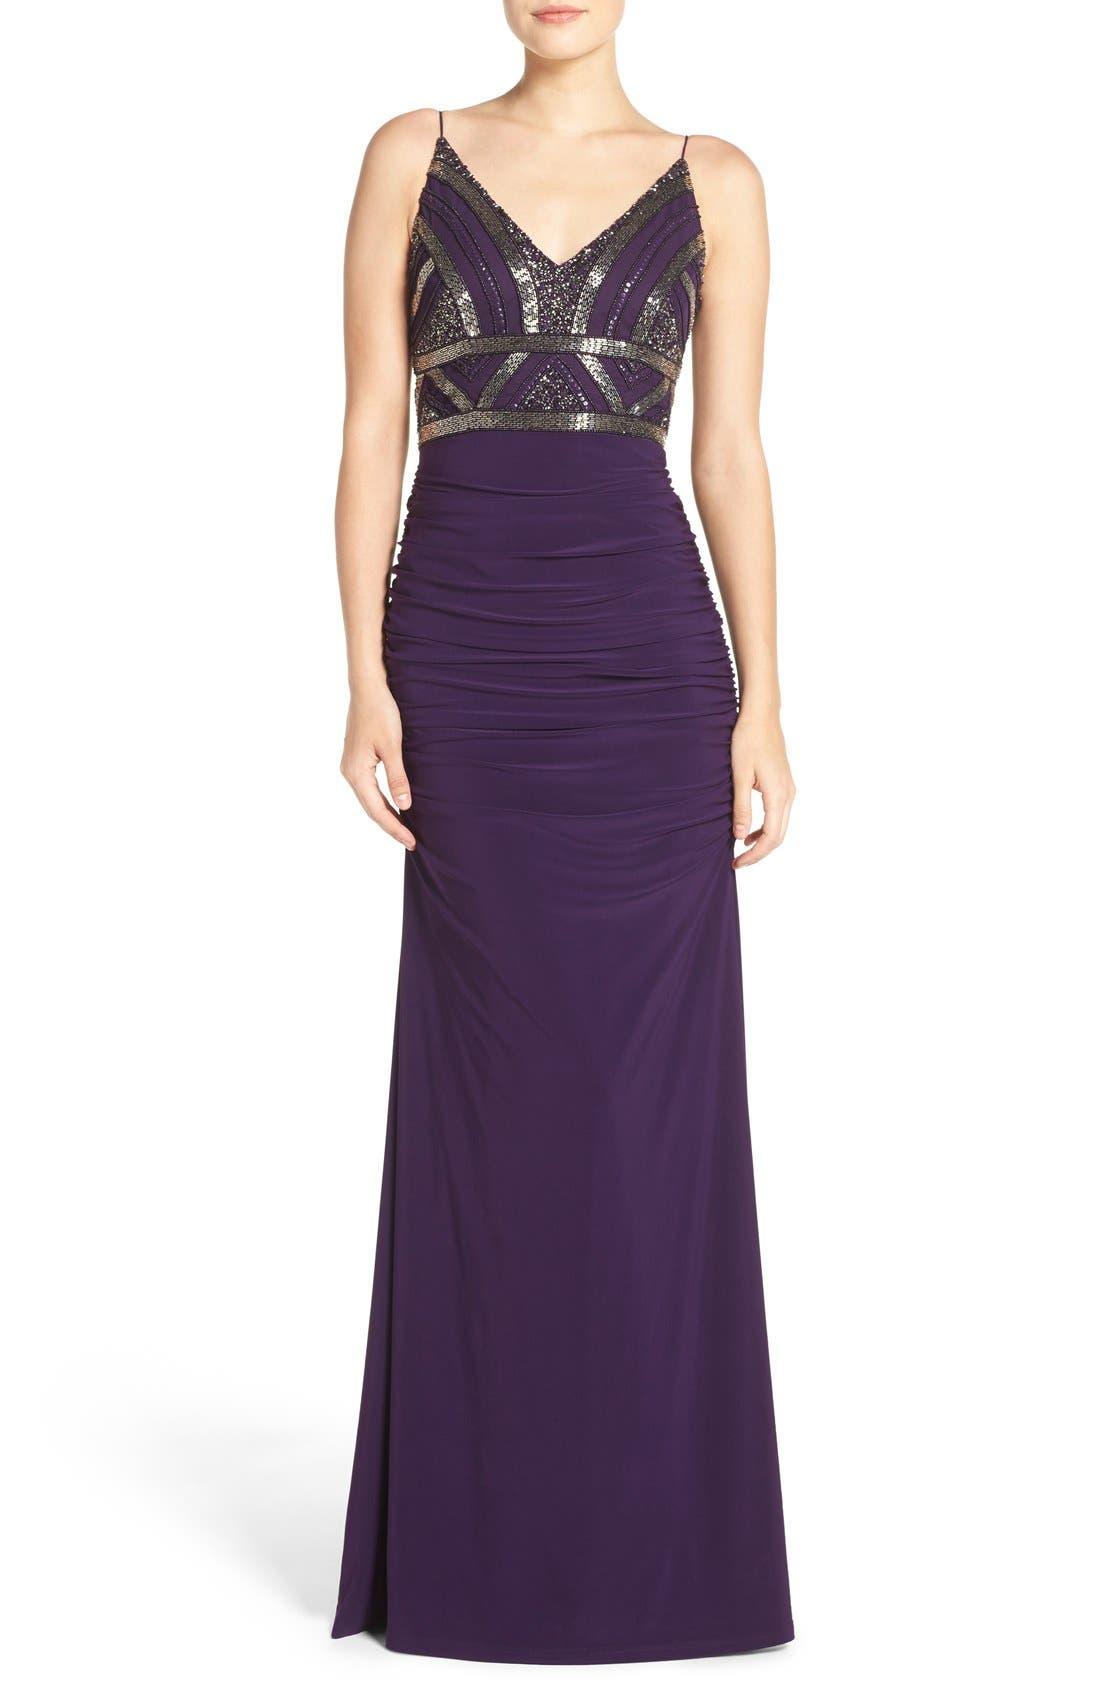 Alternate Image 1 Selected - Adrianna Papell Sleeveless Beaded Bodice Dress